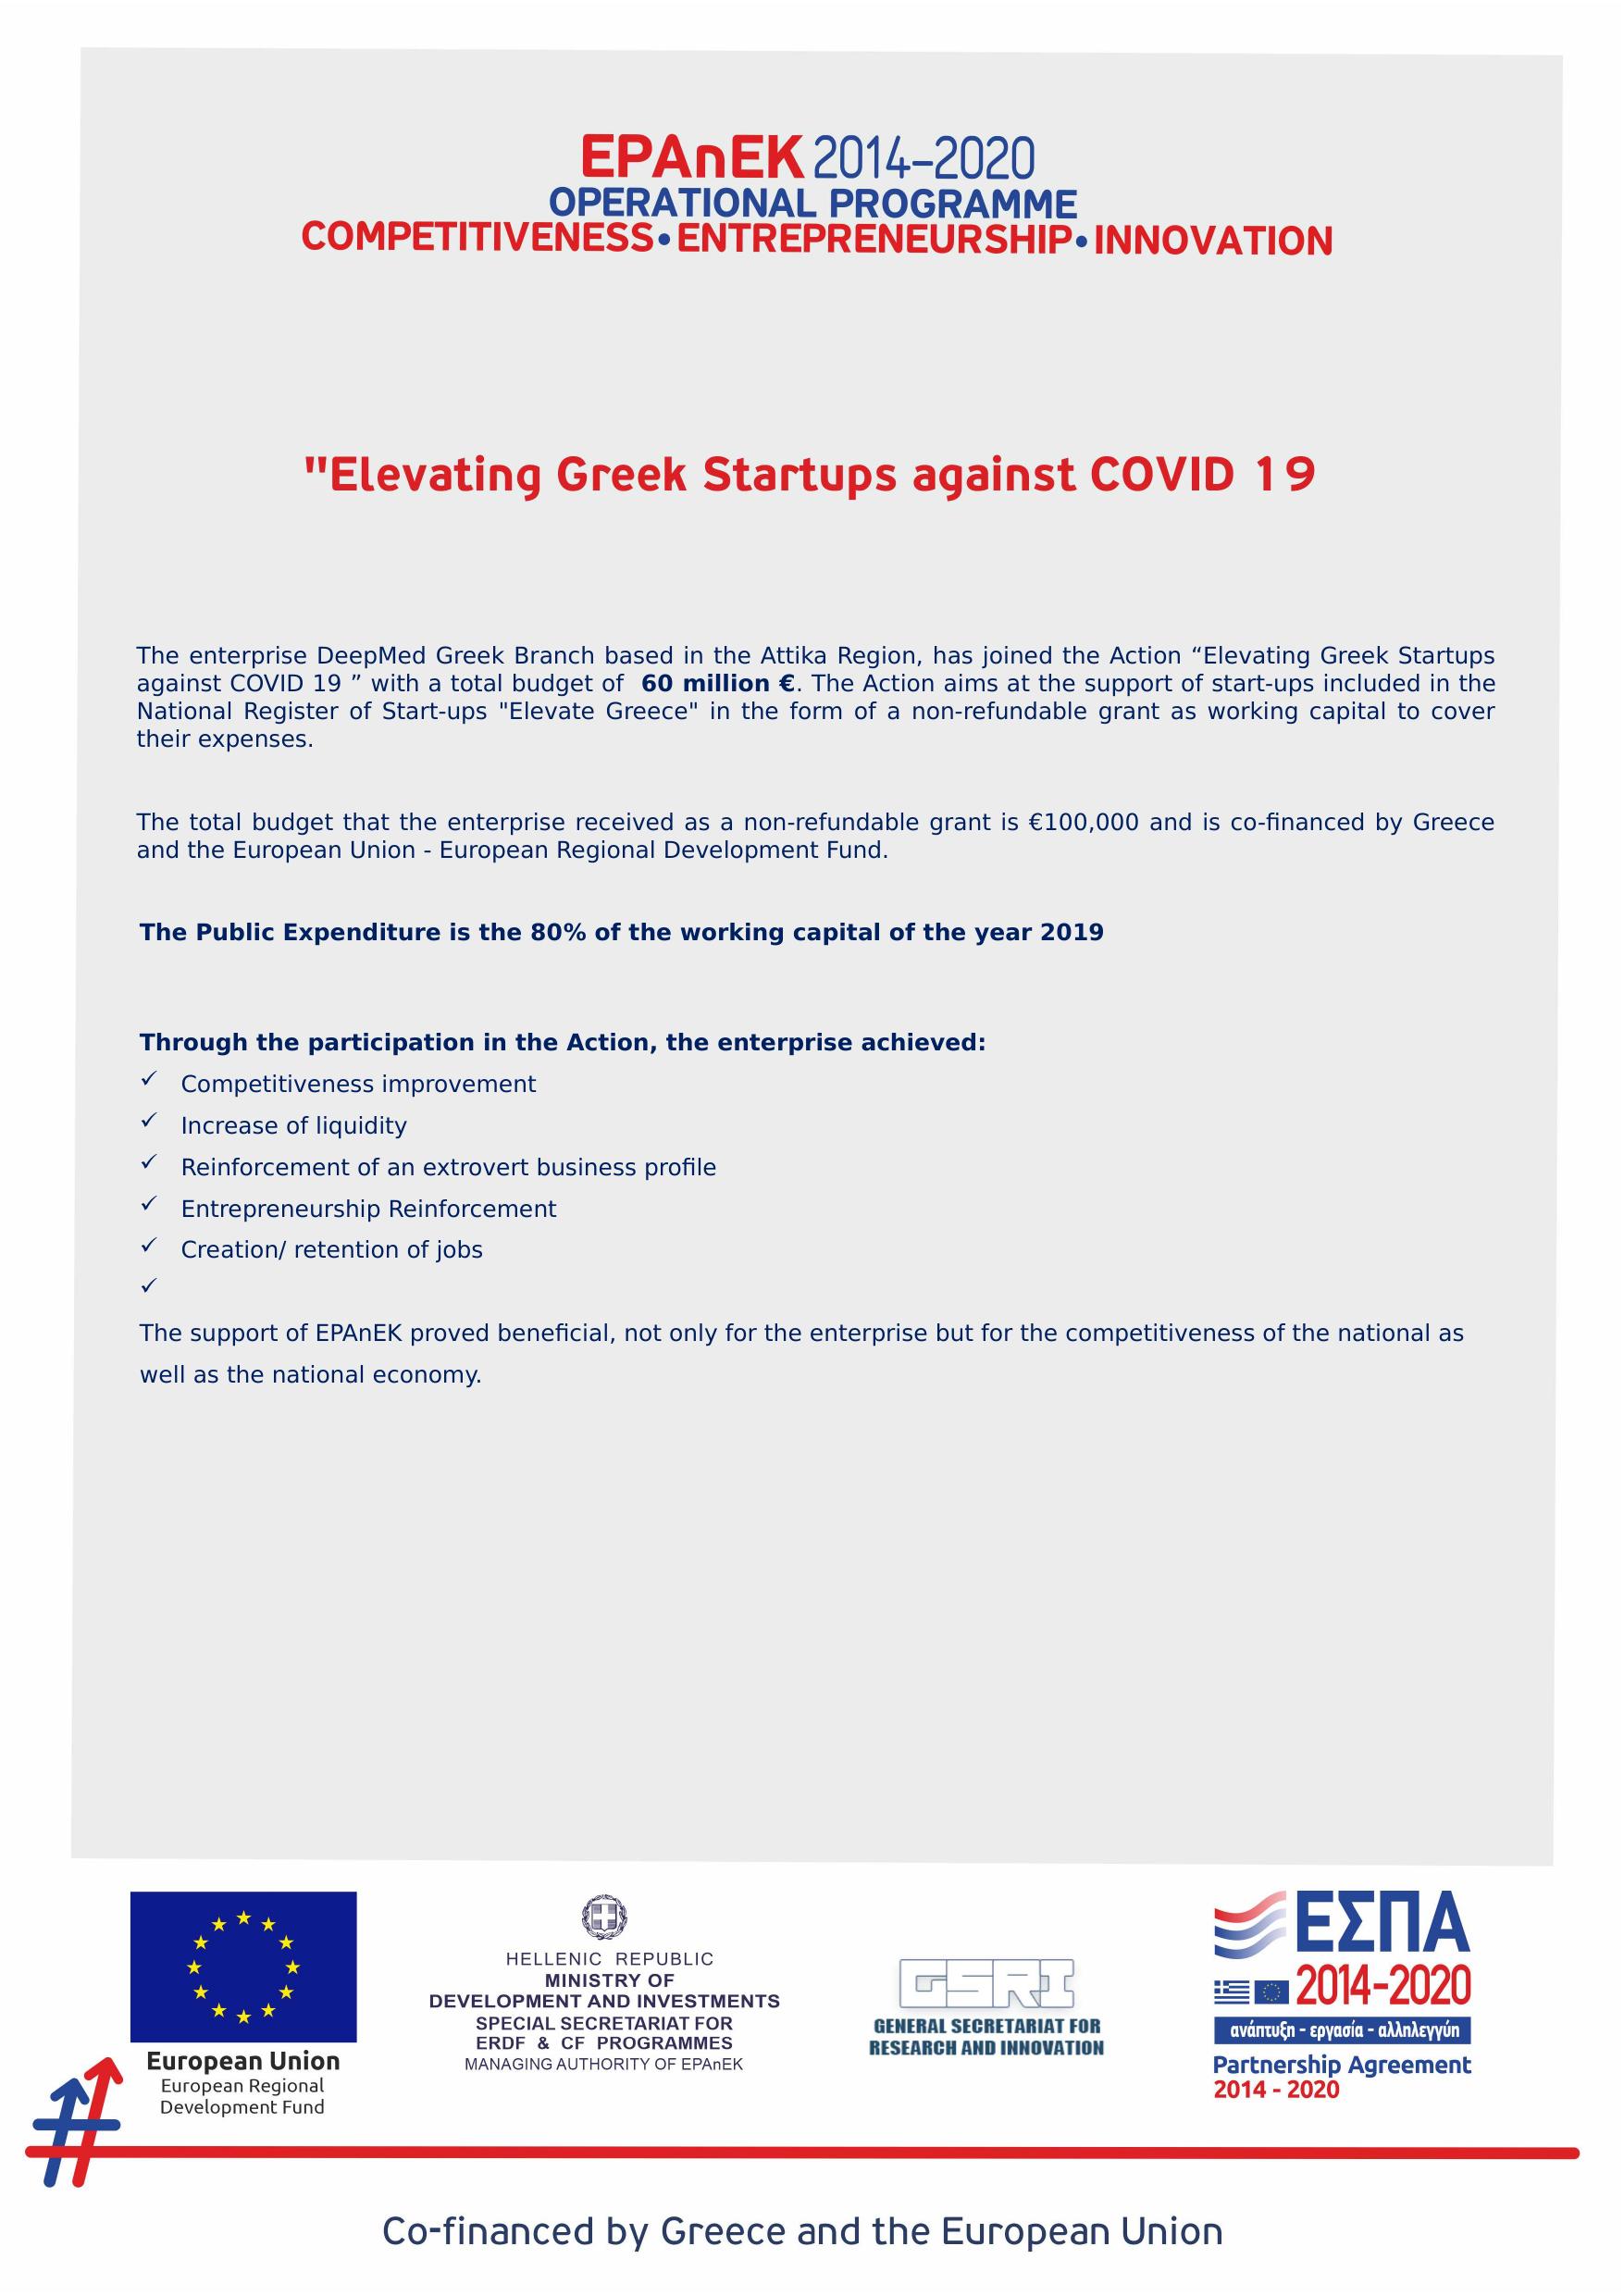 elevating Greek startups against covid 19